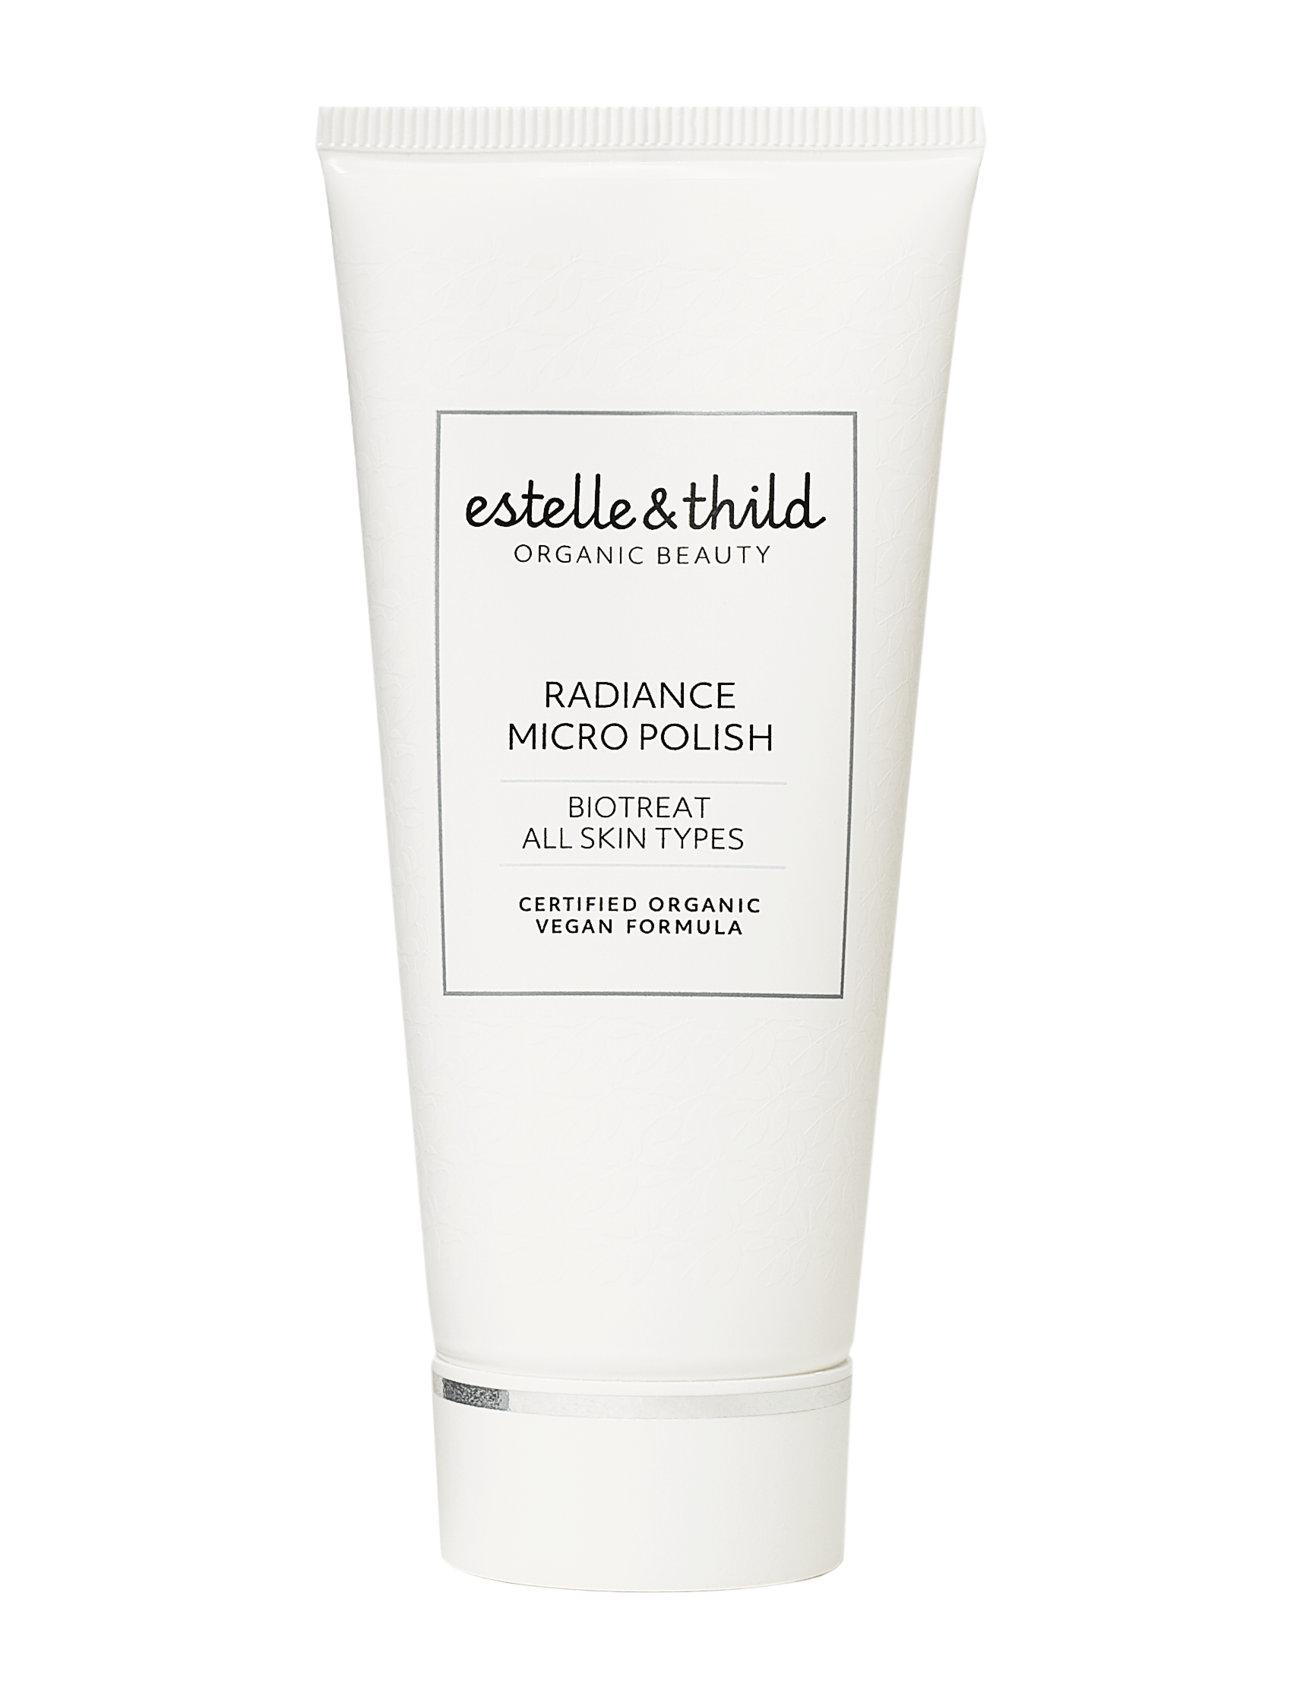 Biocleanse Radiance Micro Polish - Estelle & Thild